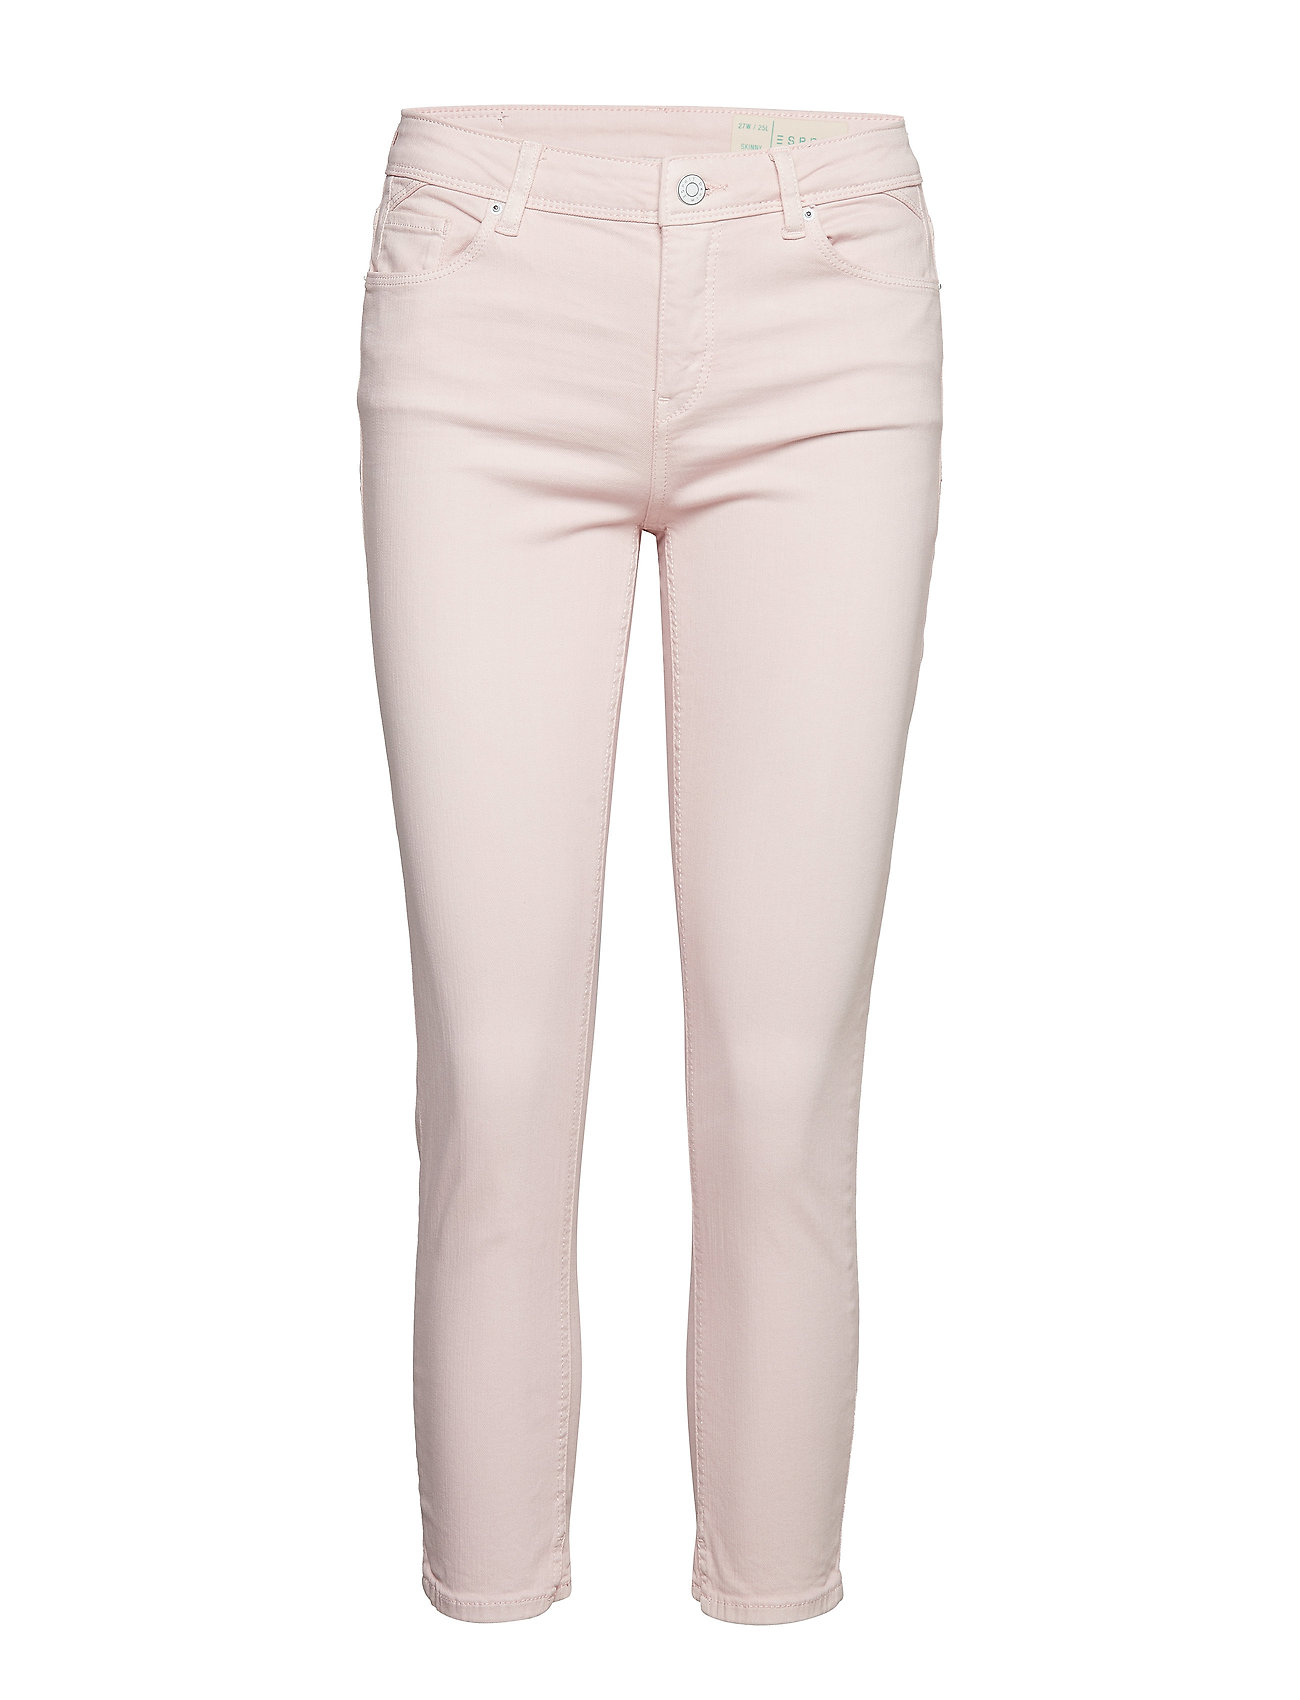 Esprit Casual Pants denim - LIGHT PINK